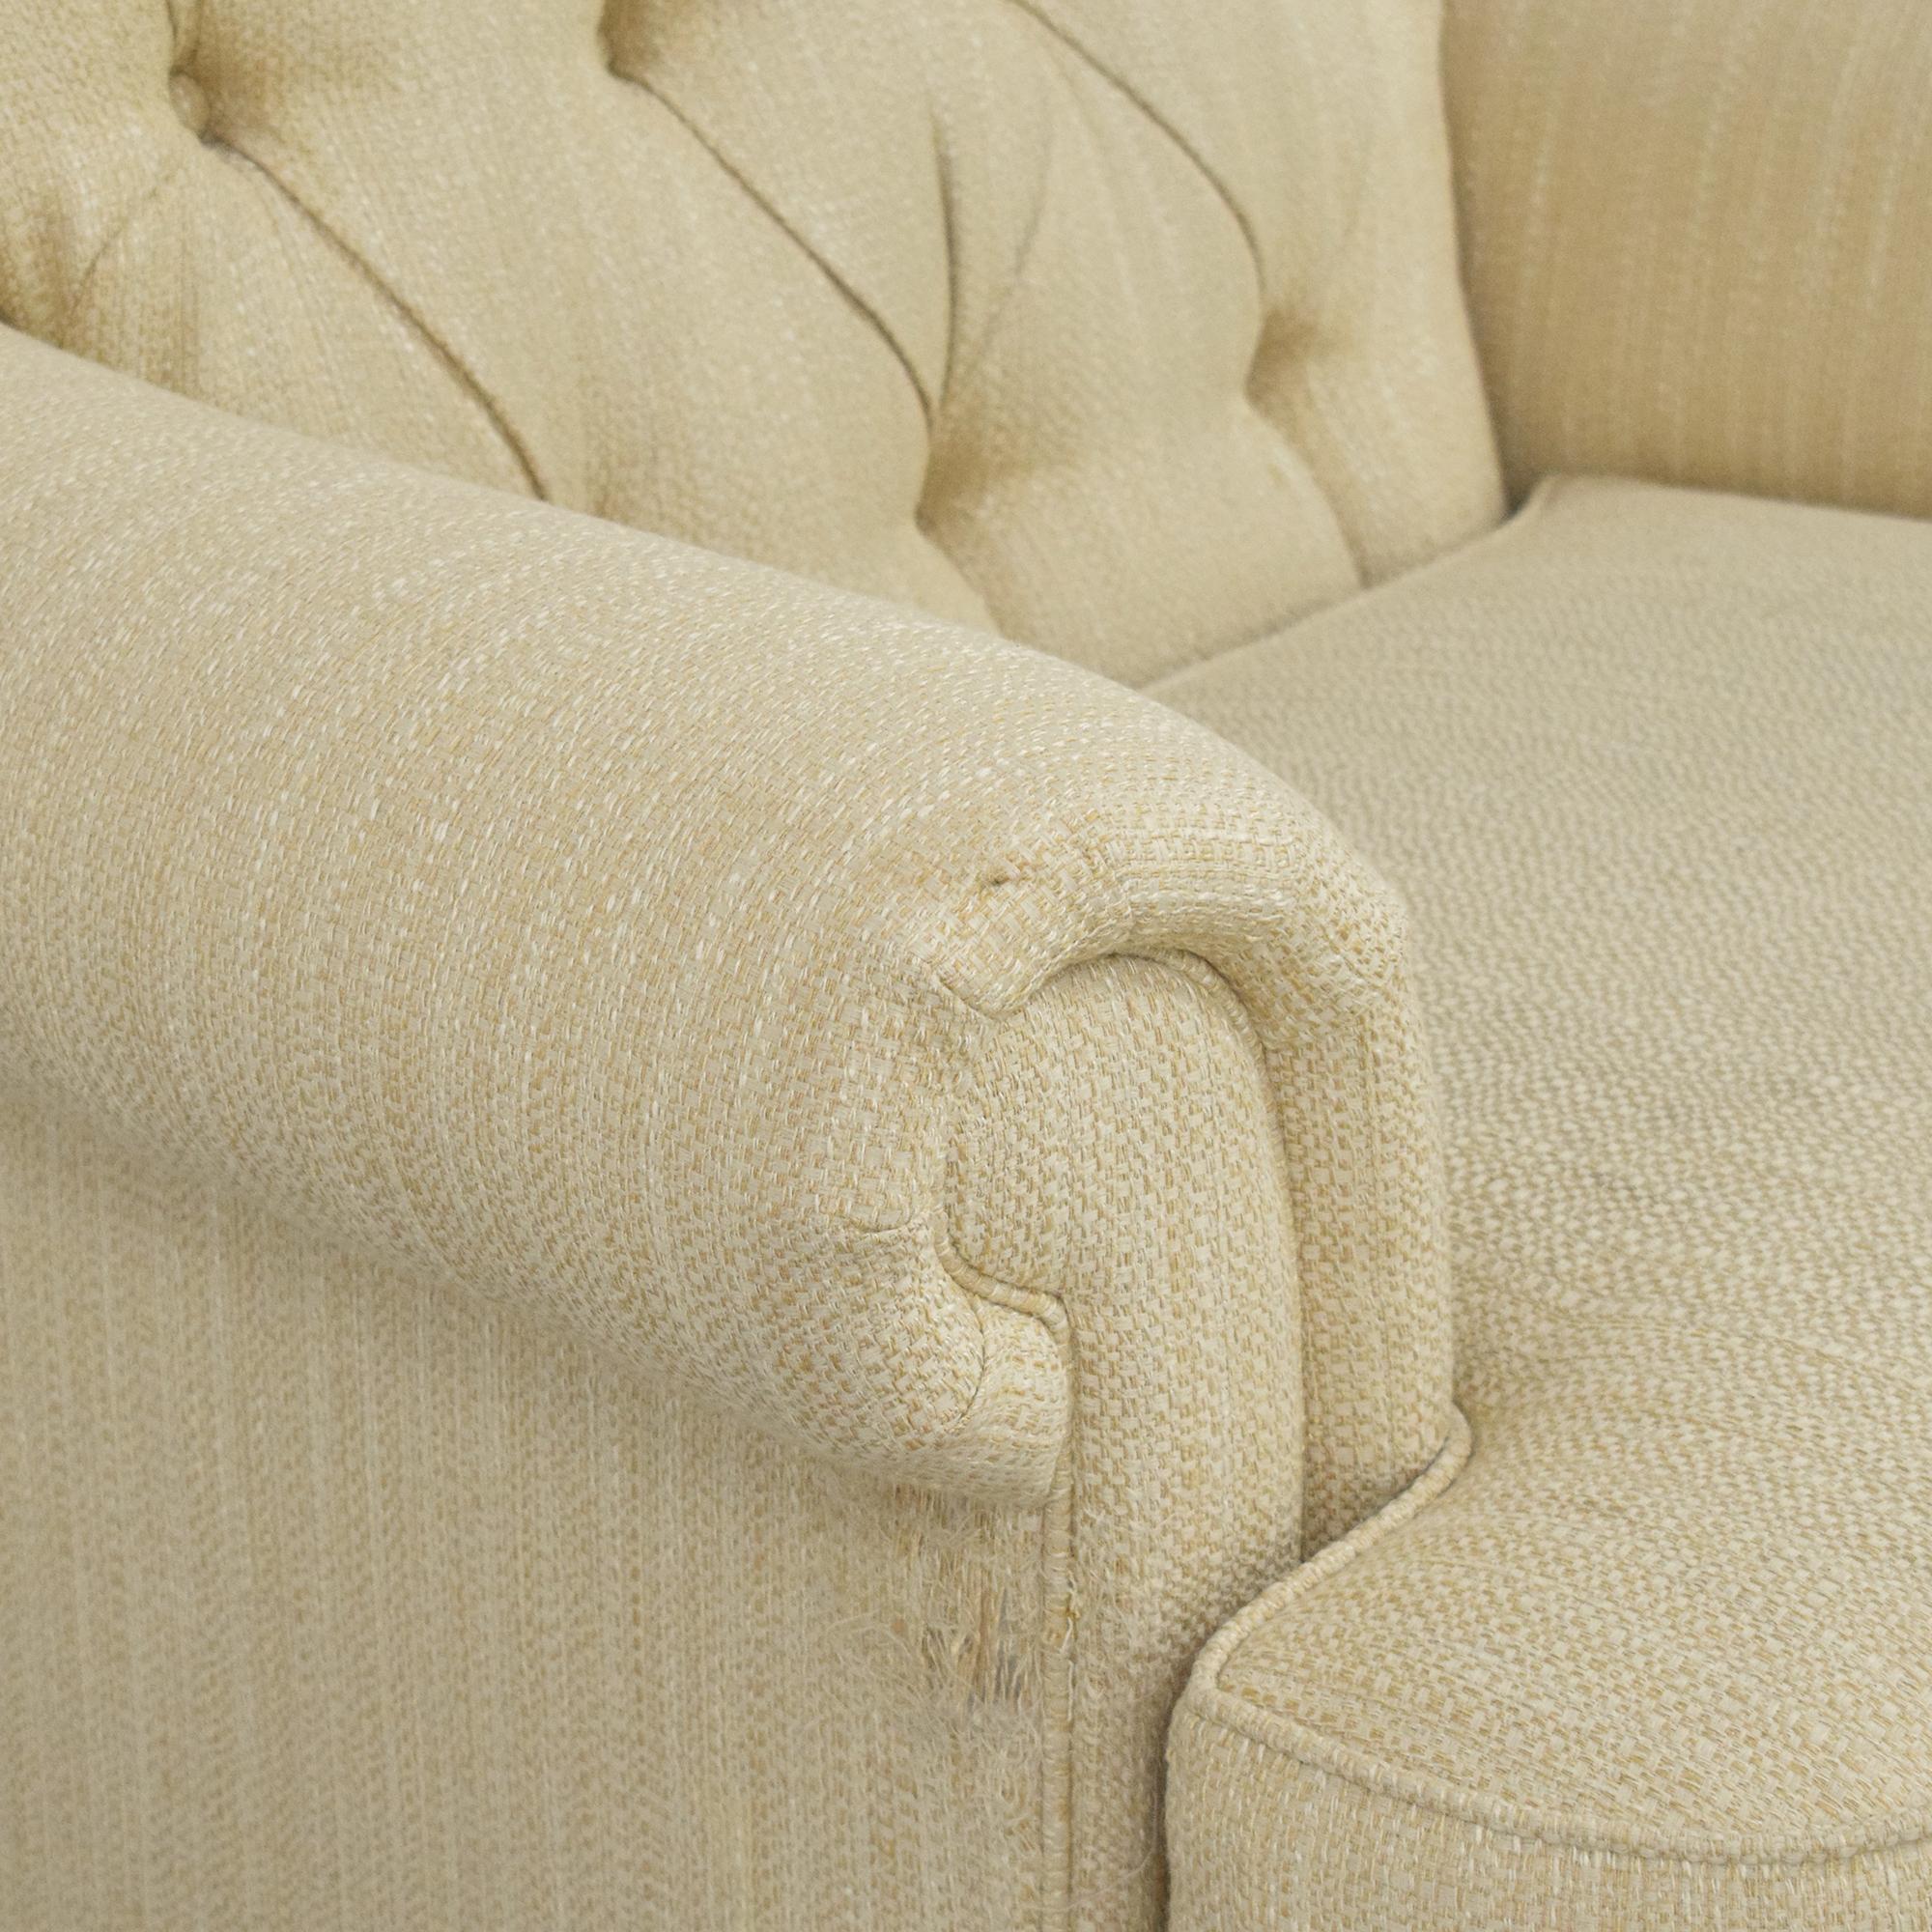 buy Ethan Allen Ethan Allen Shawe Chair online